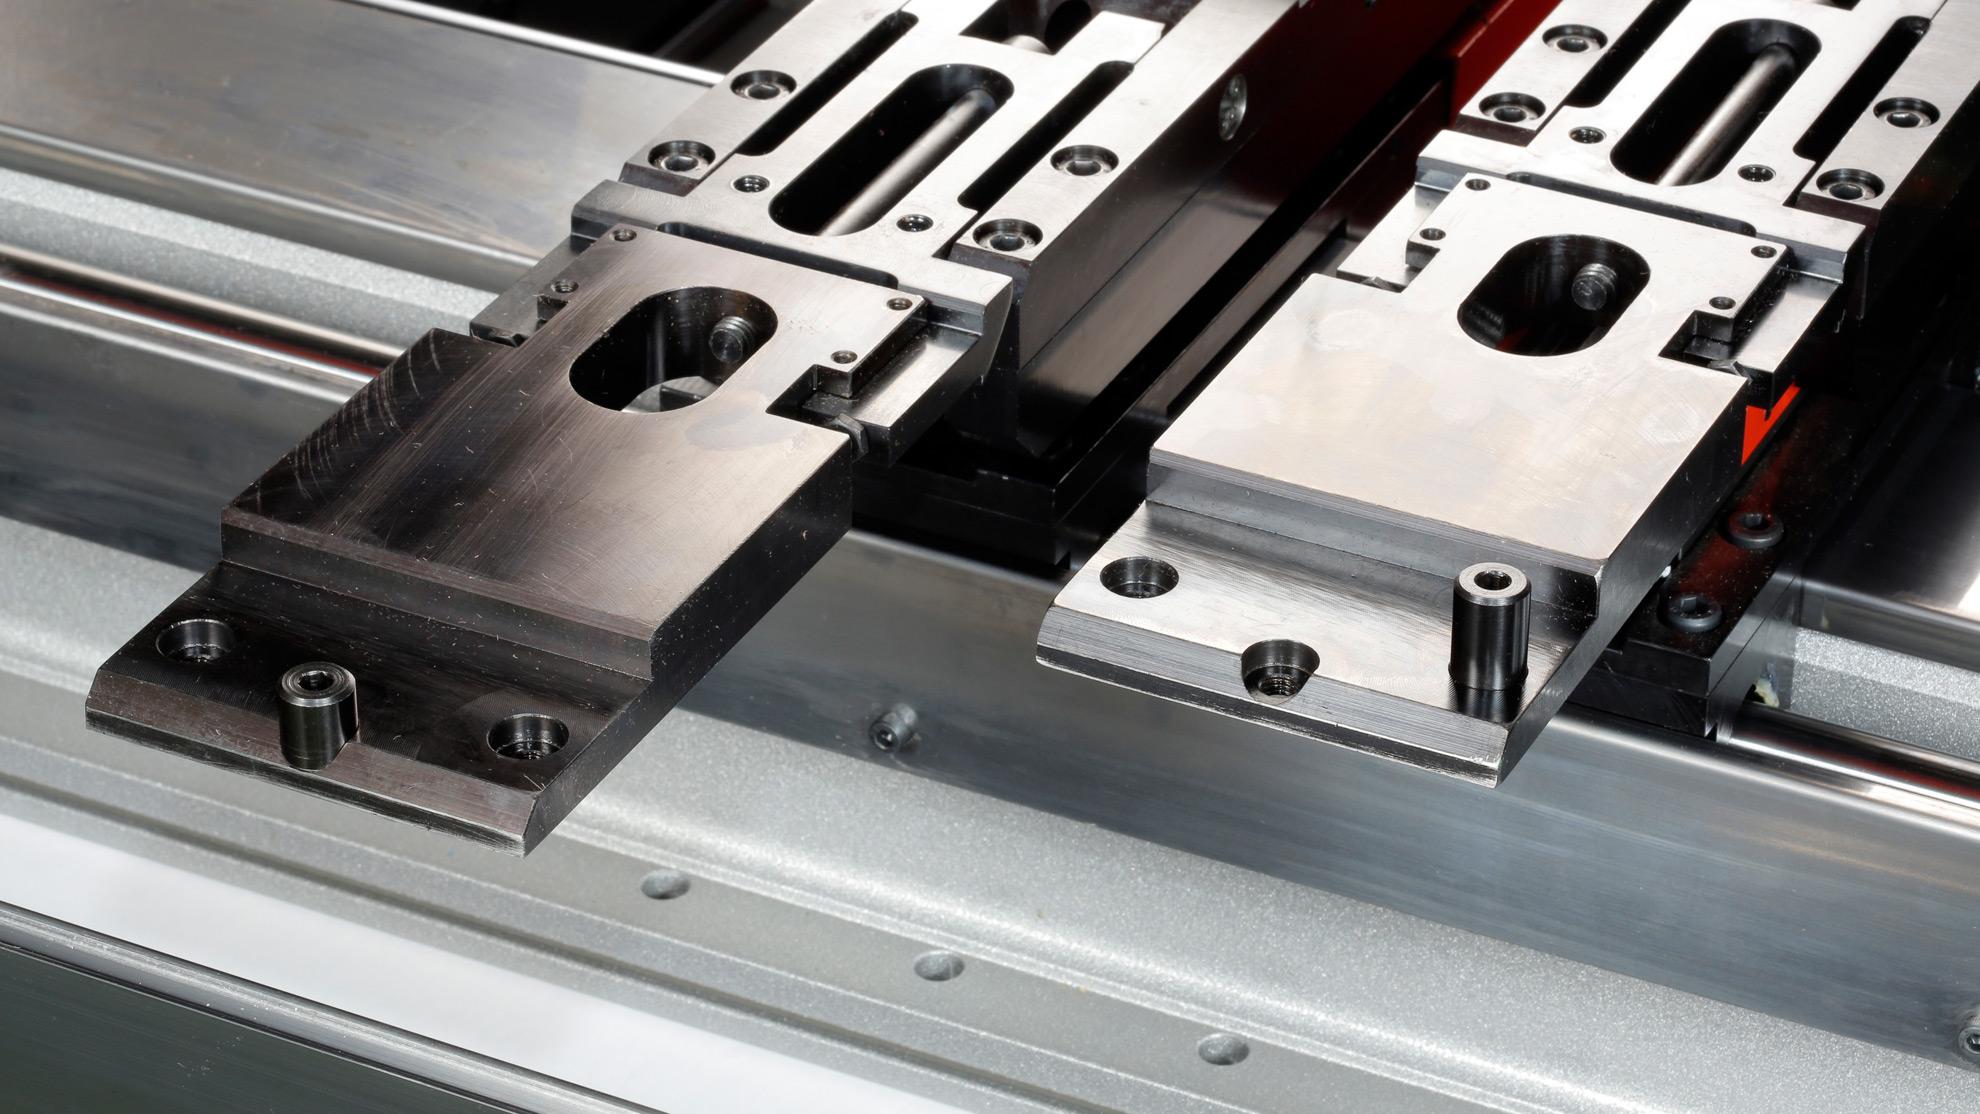 Description Hg Atc Pressbrakes With Automatic Tool